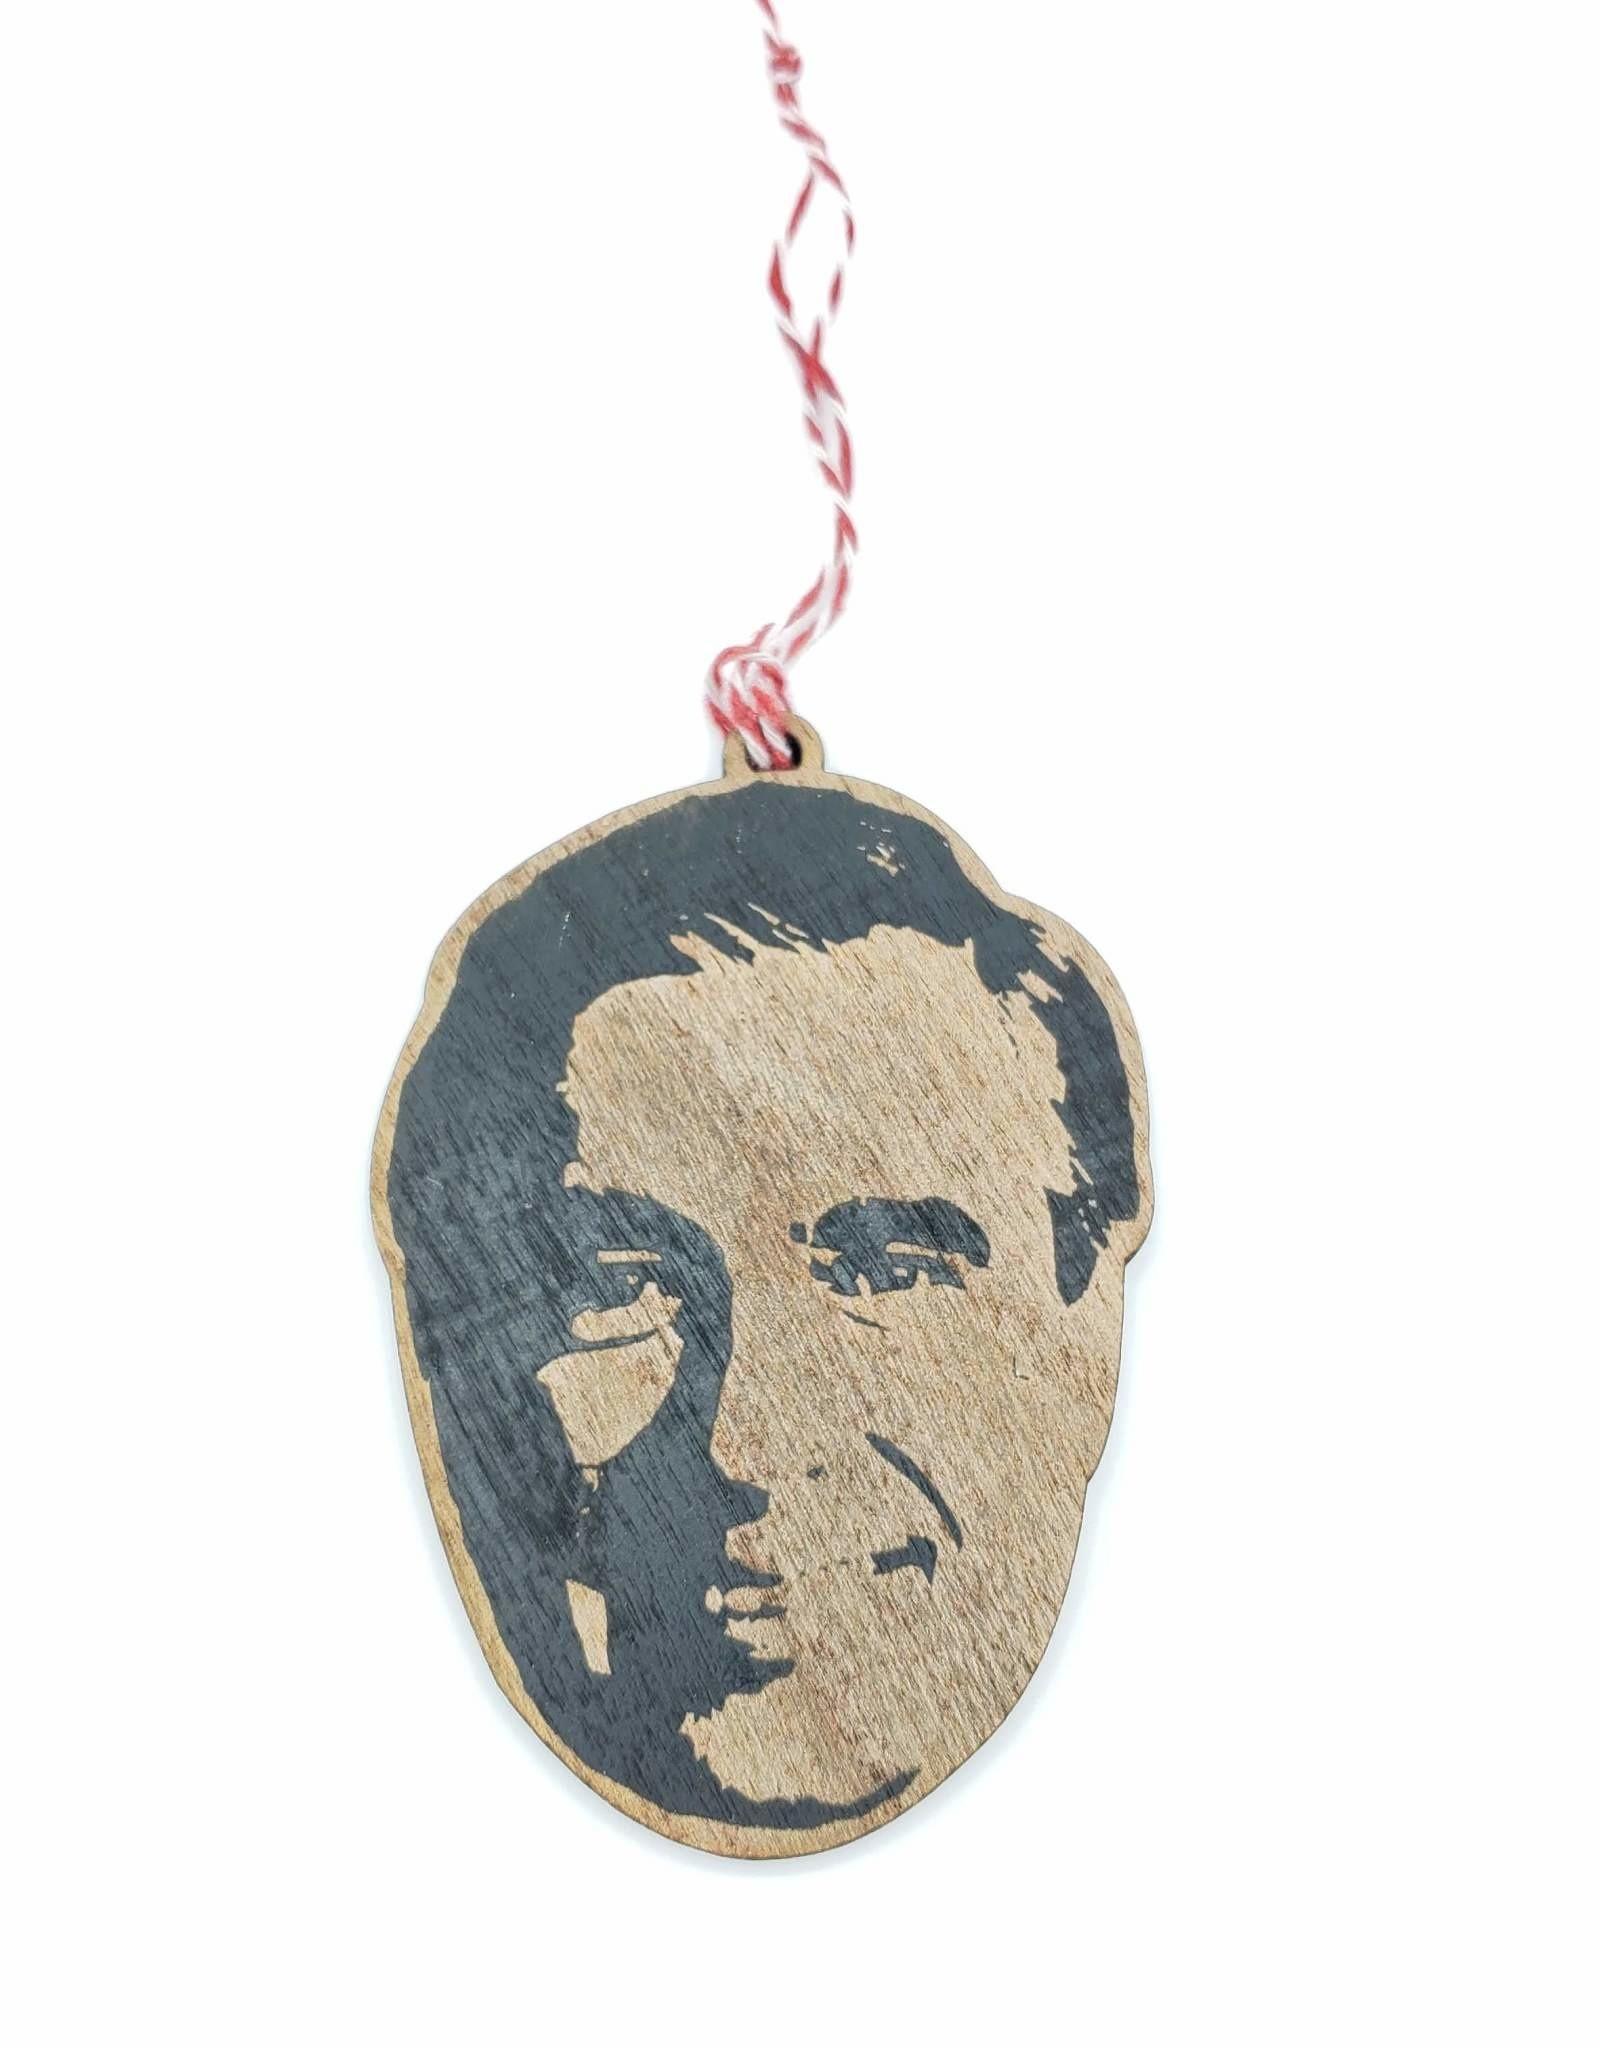 Mister Rogers Wood Ornament